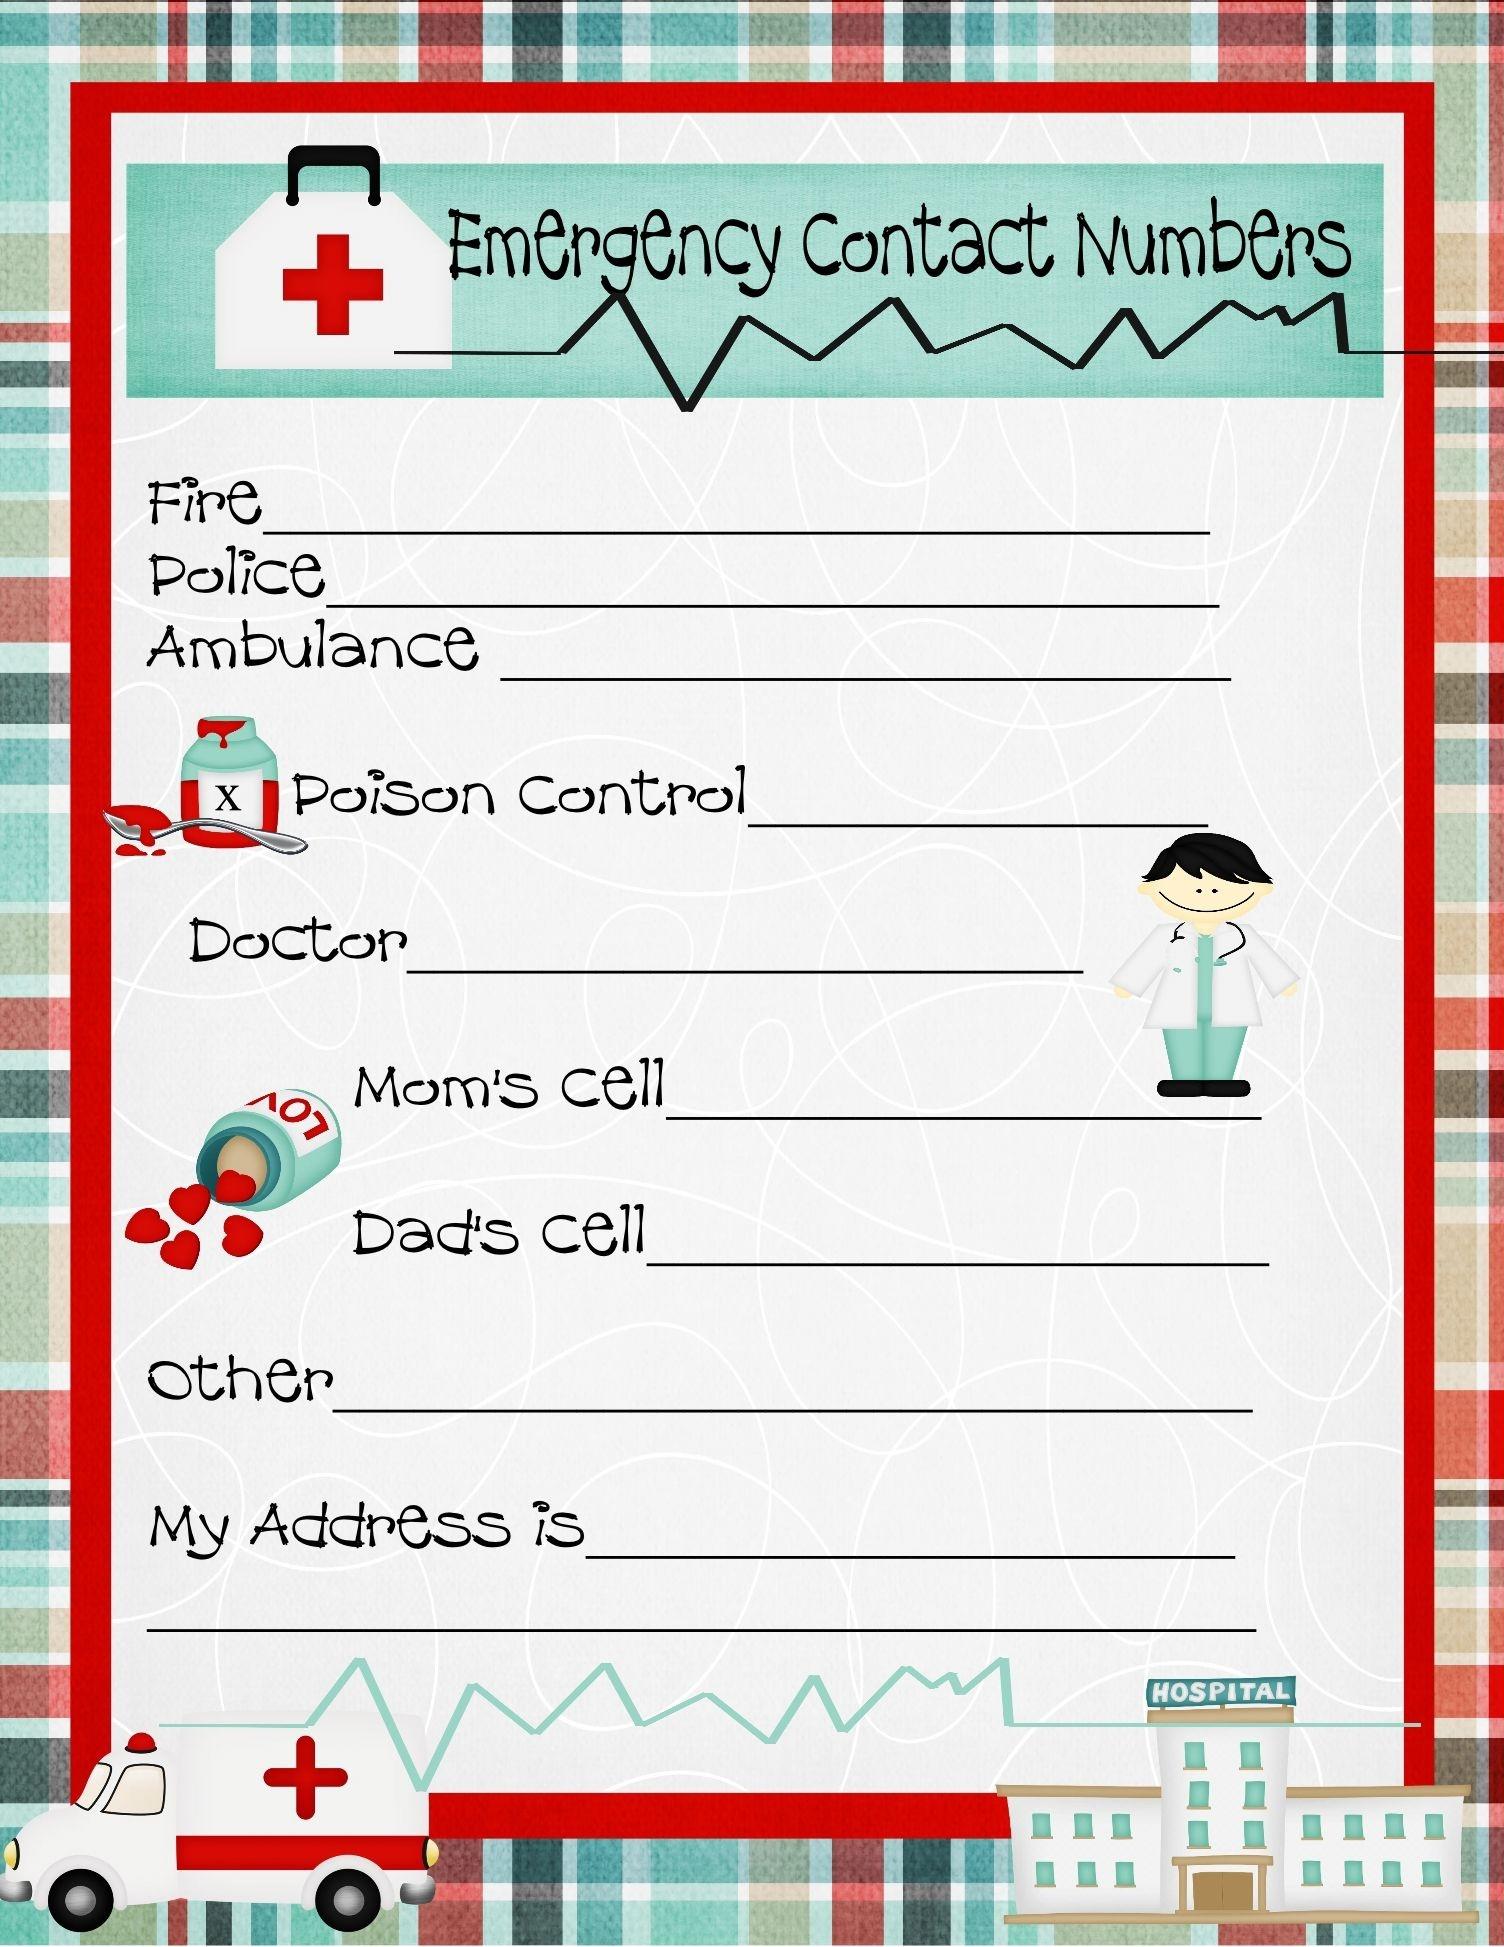 Emergency Numbers Printable | Emergency Contact Phone Numbers And A - Free Printable Emergency Phone List